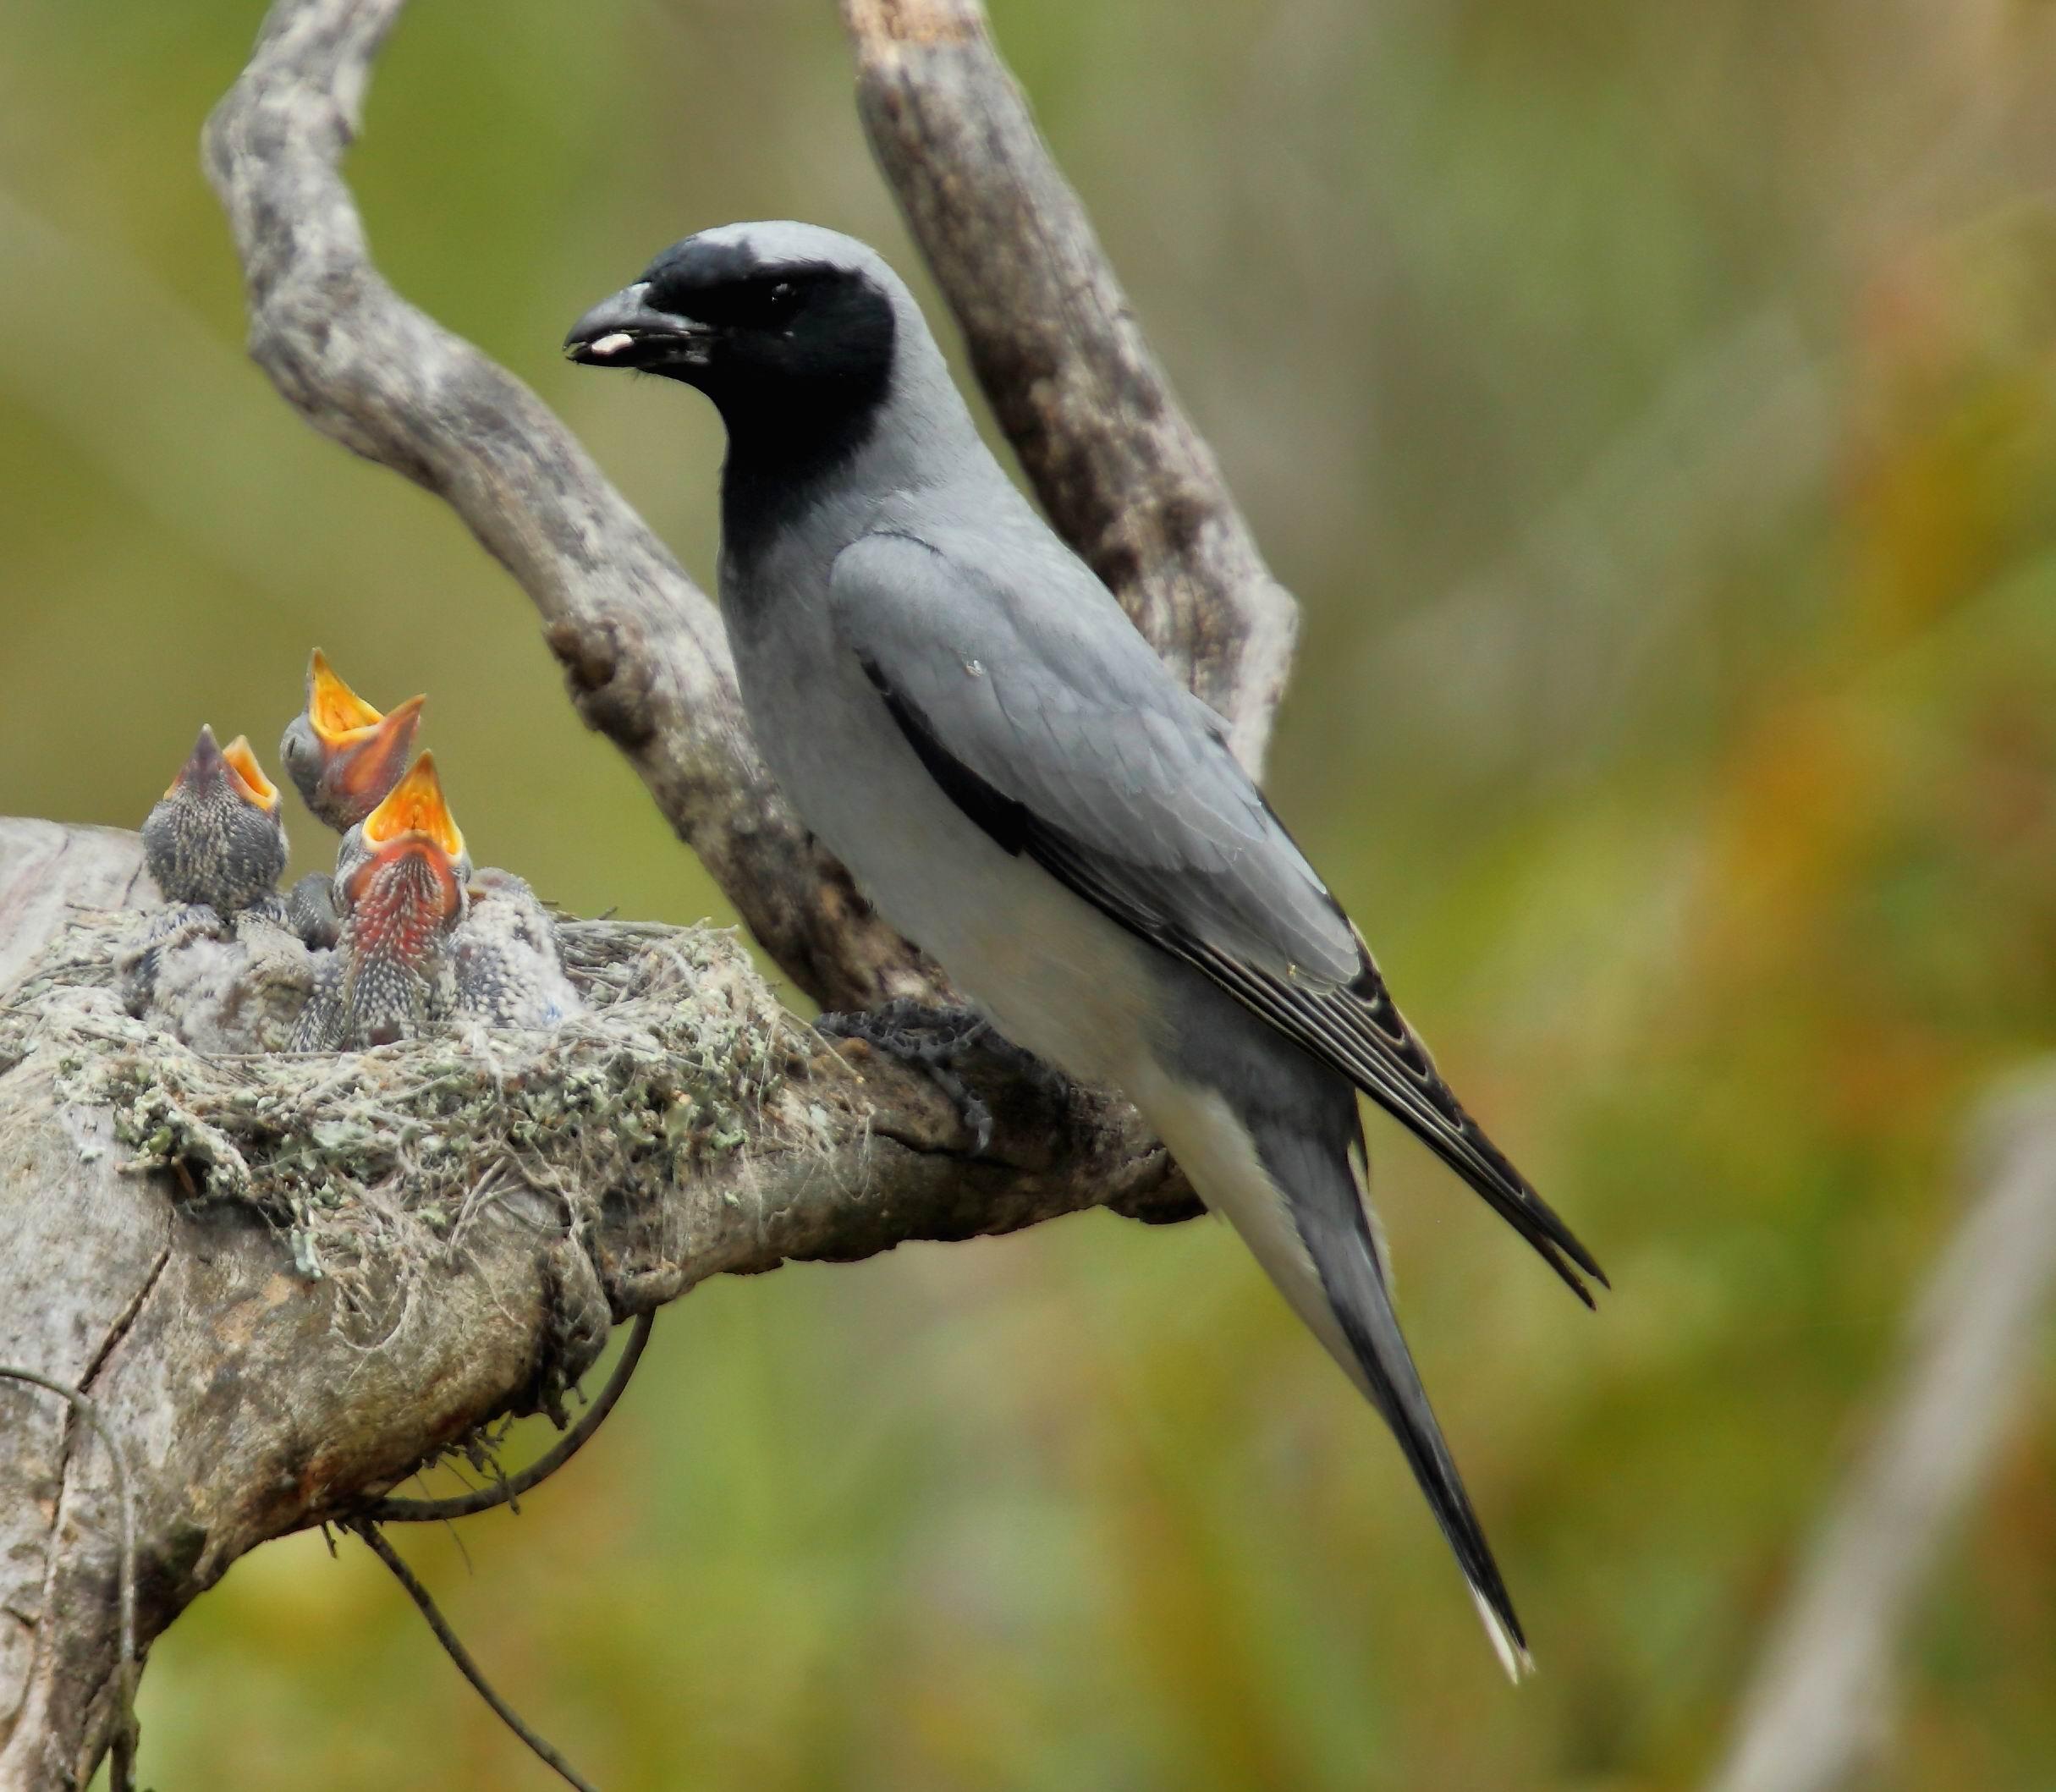 Black cuckoo bird - photo#12